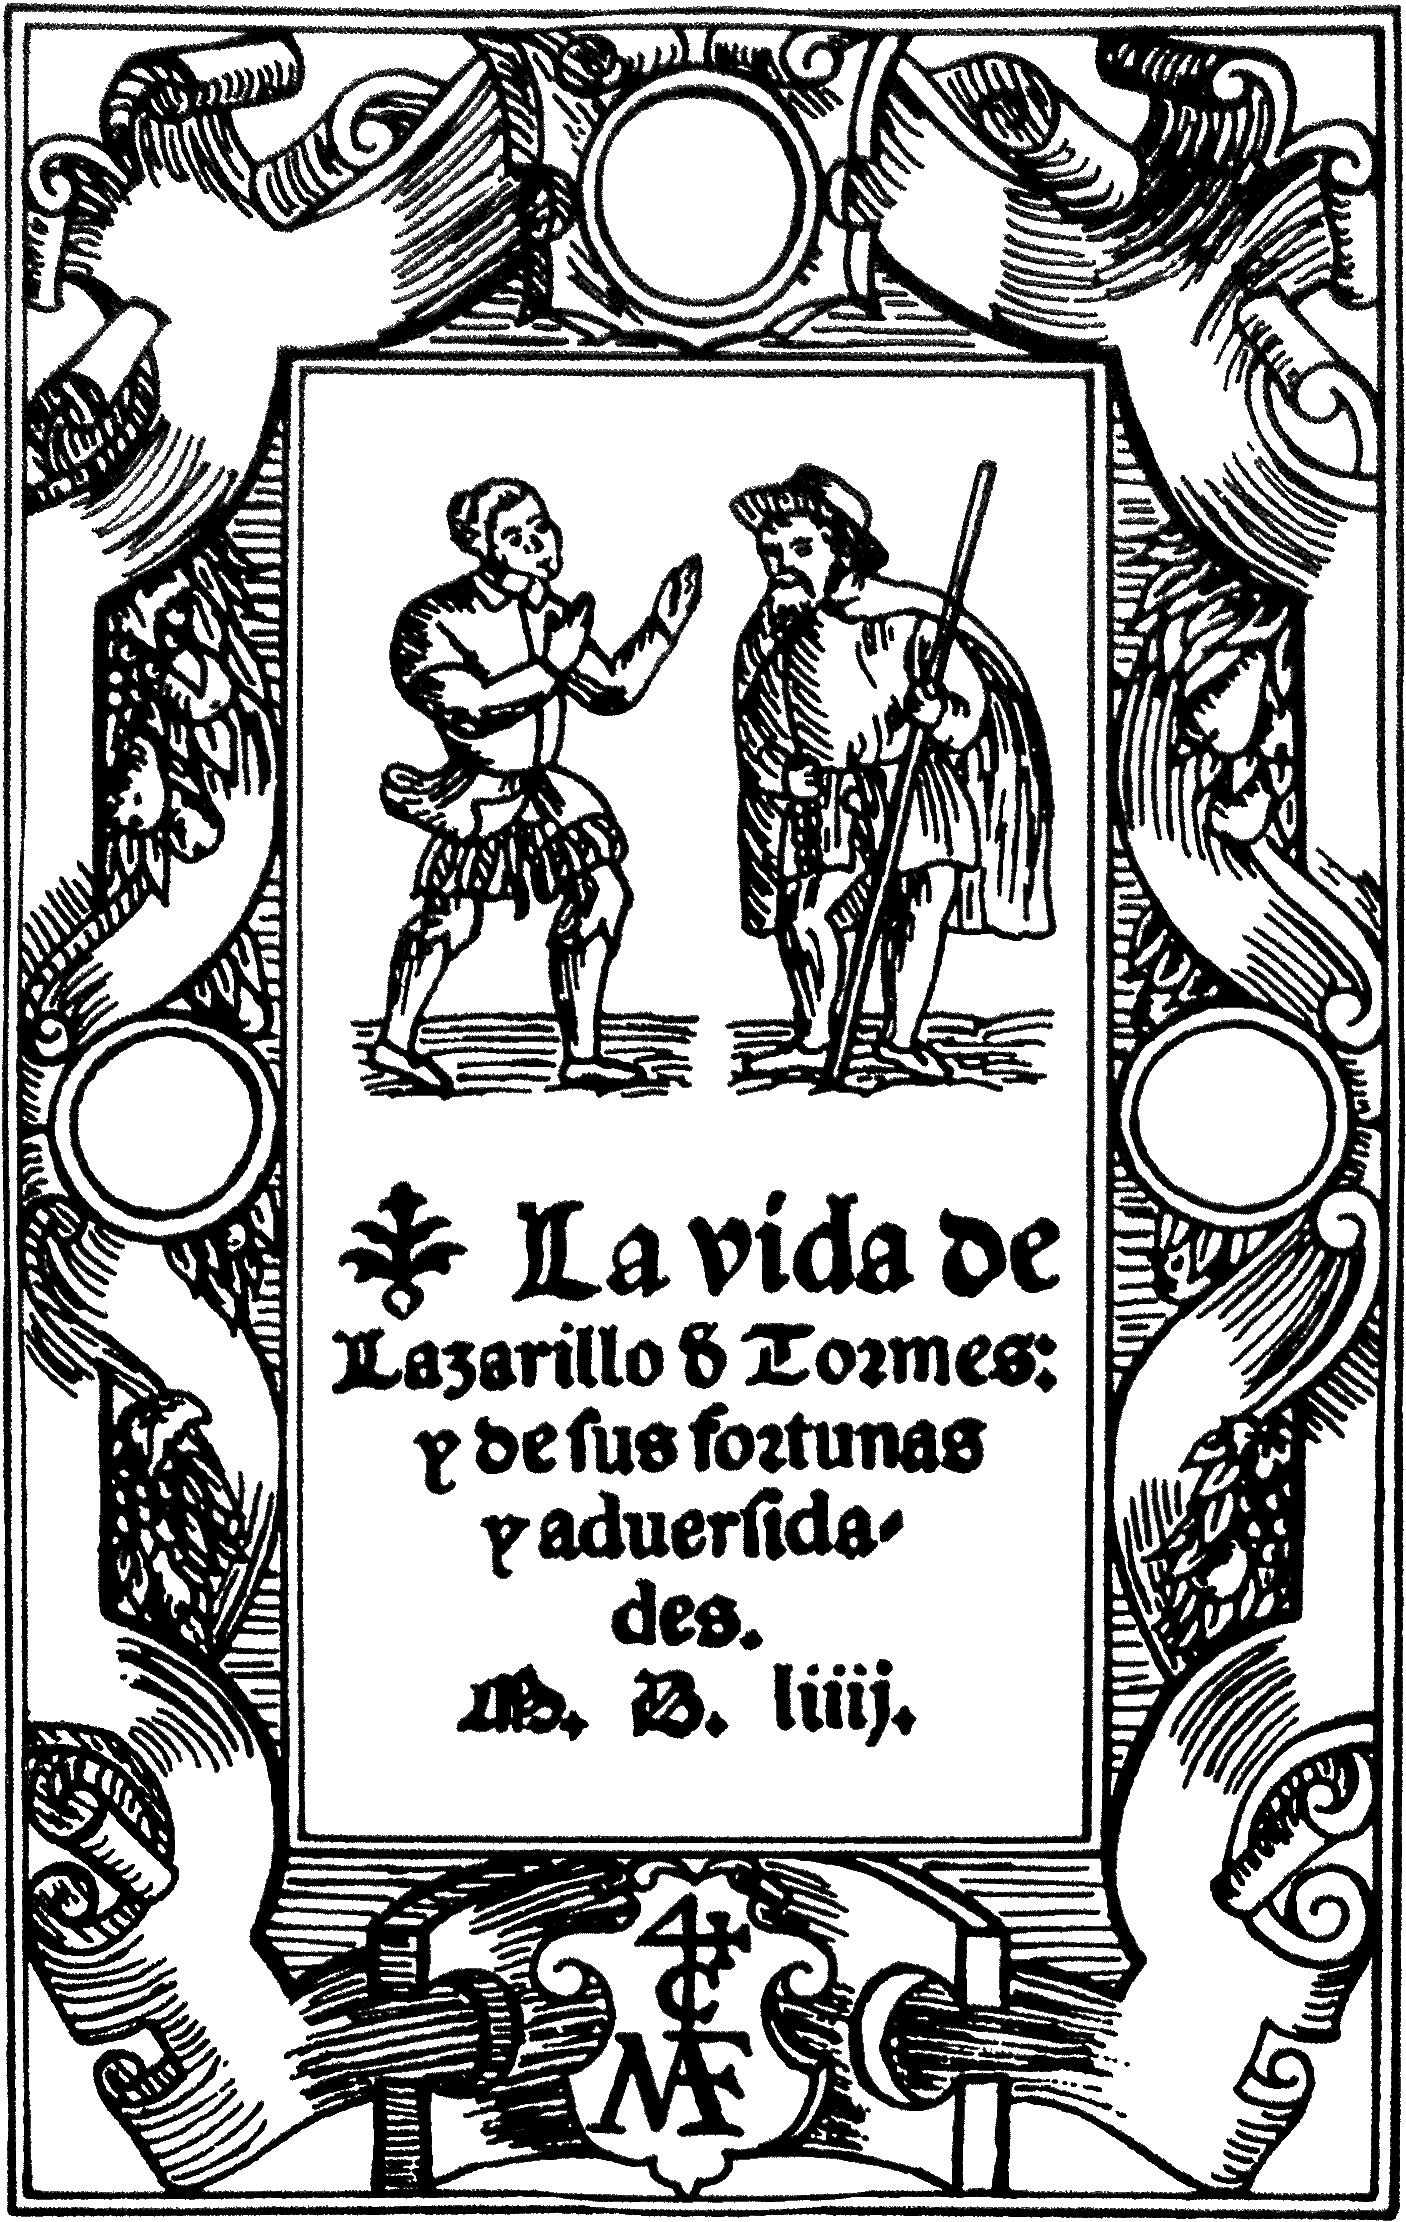 Portada del Lazarillo de Tormes sacada de la Wikipedia